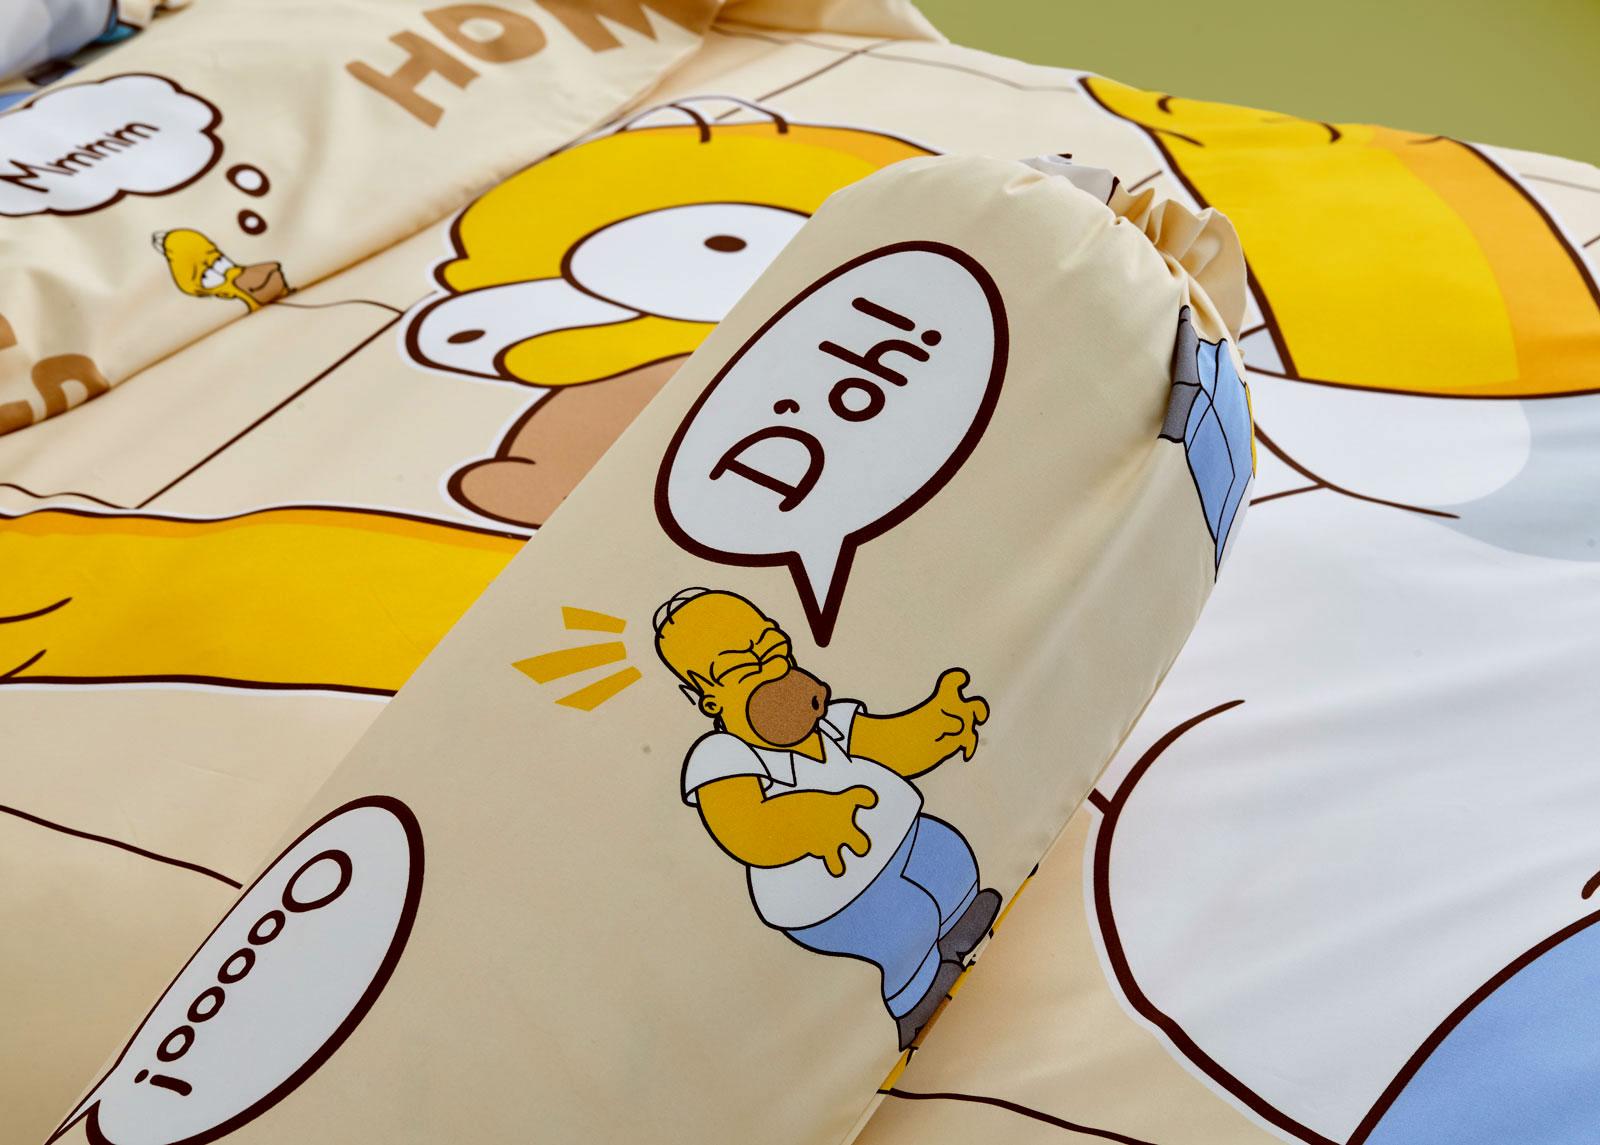 Lotus รุ่น Pop-art The Simpsons ชุดผ้าปูที่นอน LI-SS-03 (3.5 ft.)